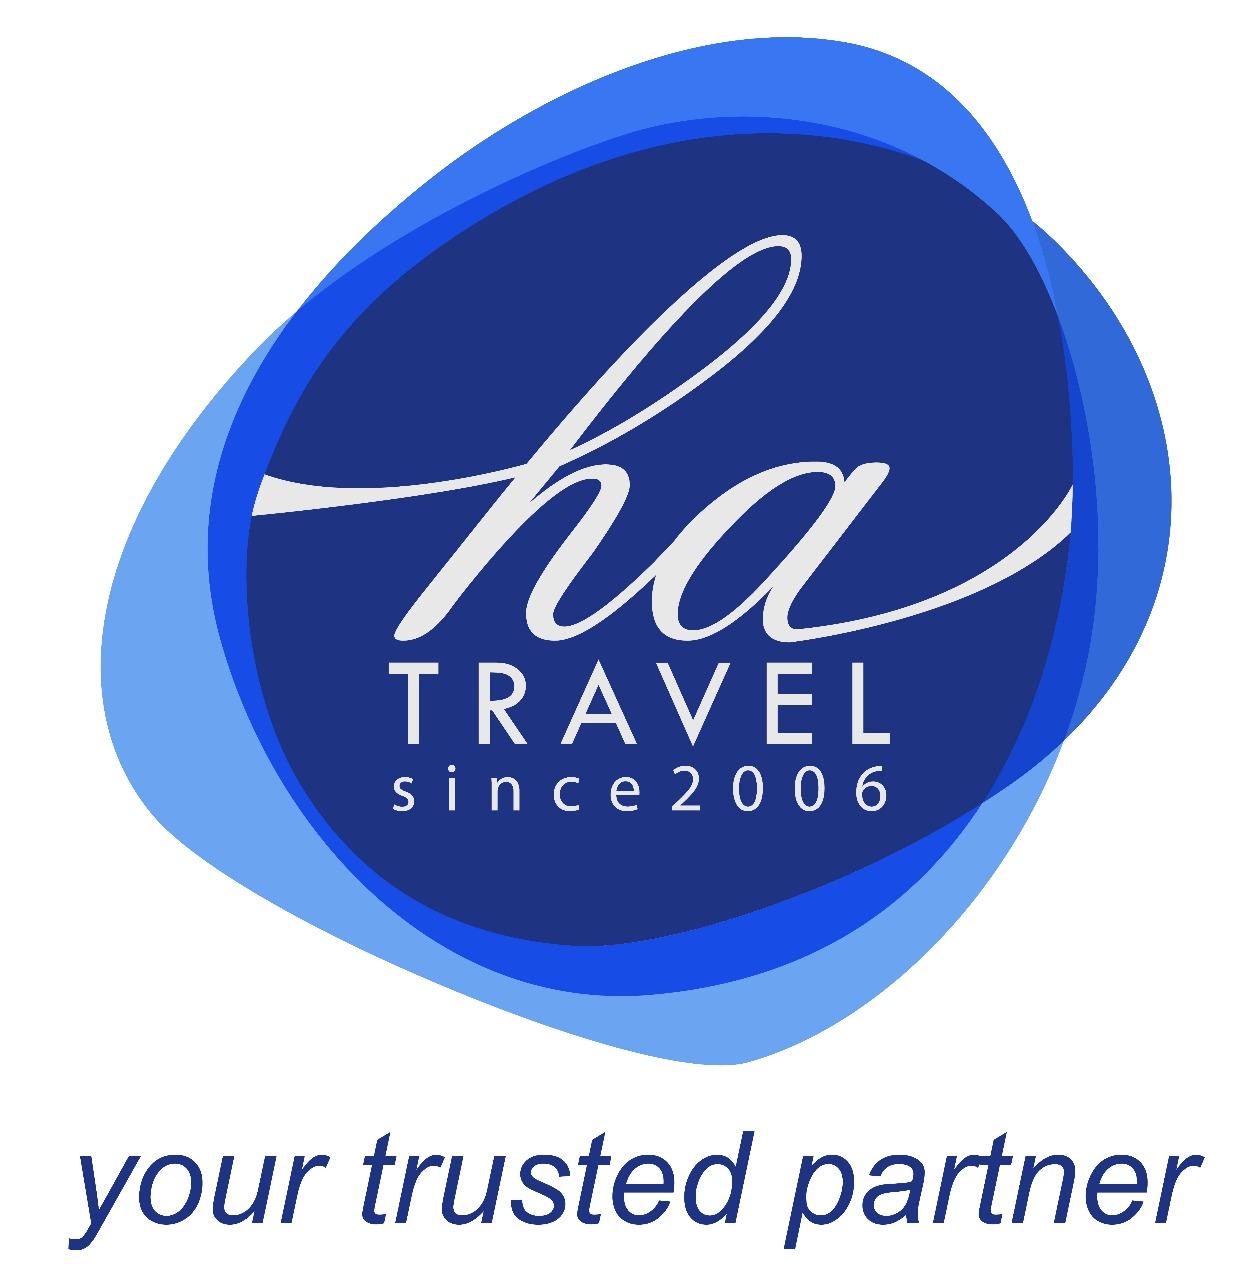 Tour company through Vietnam, Cambodia, Laos, and more!